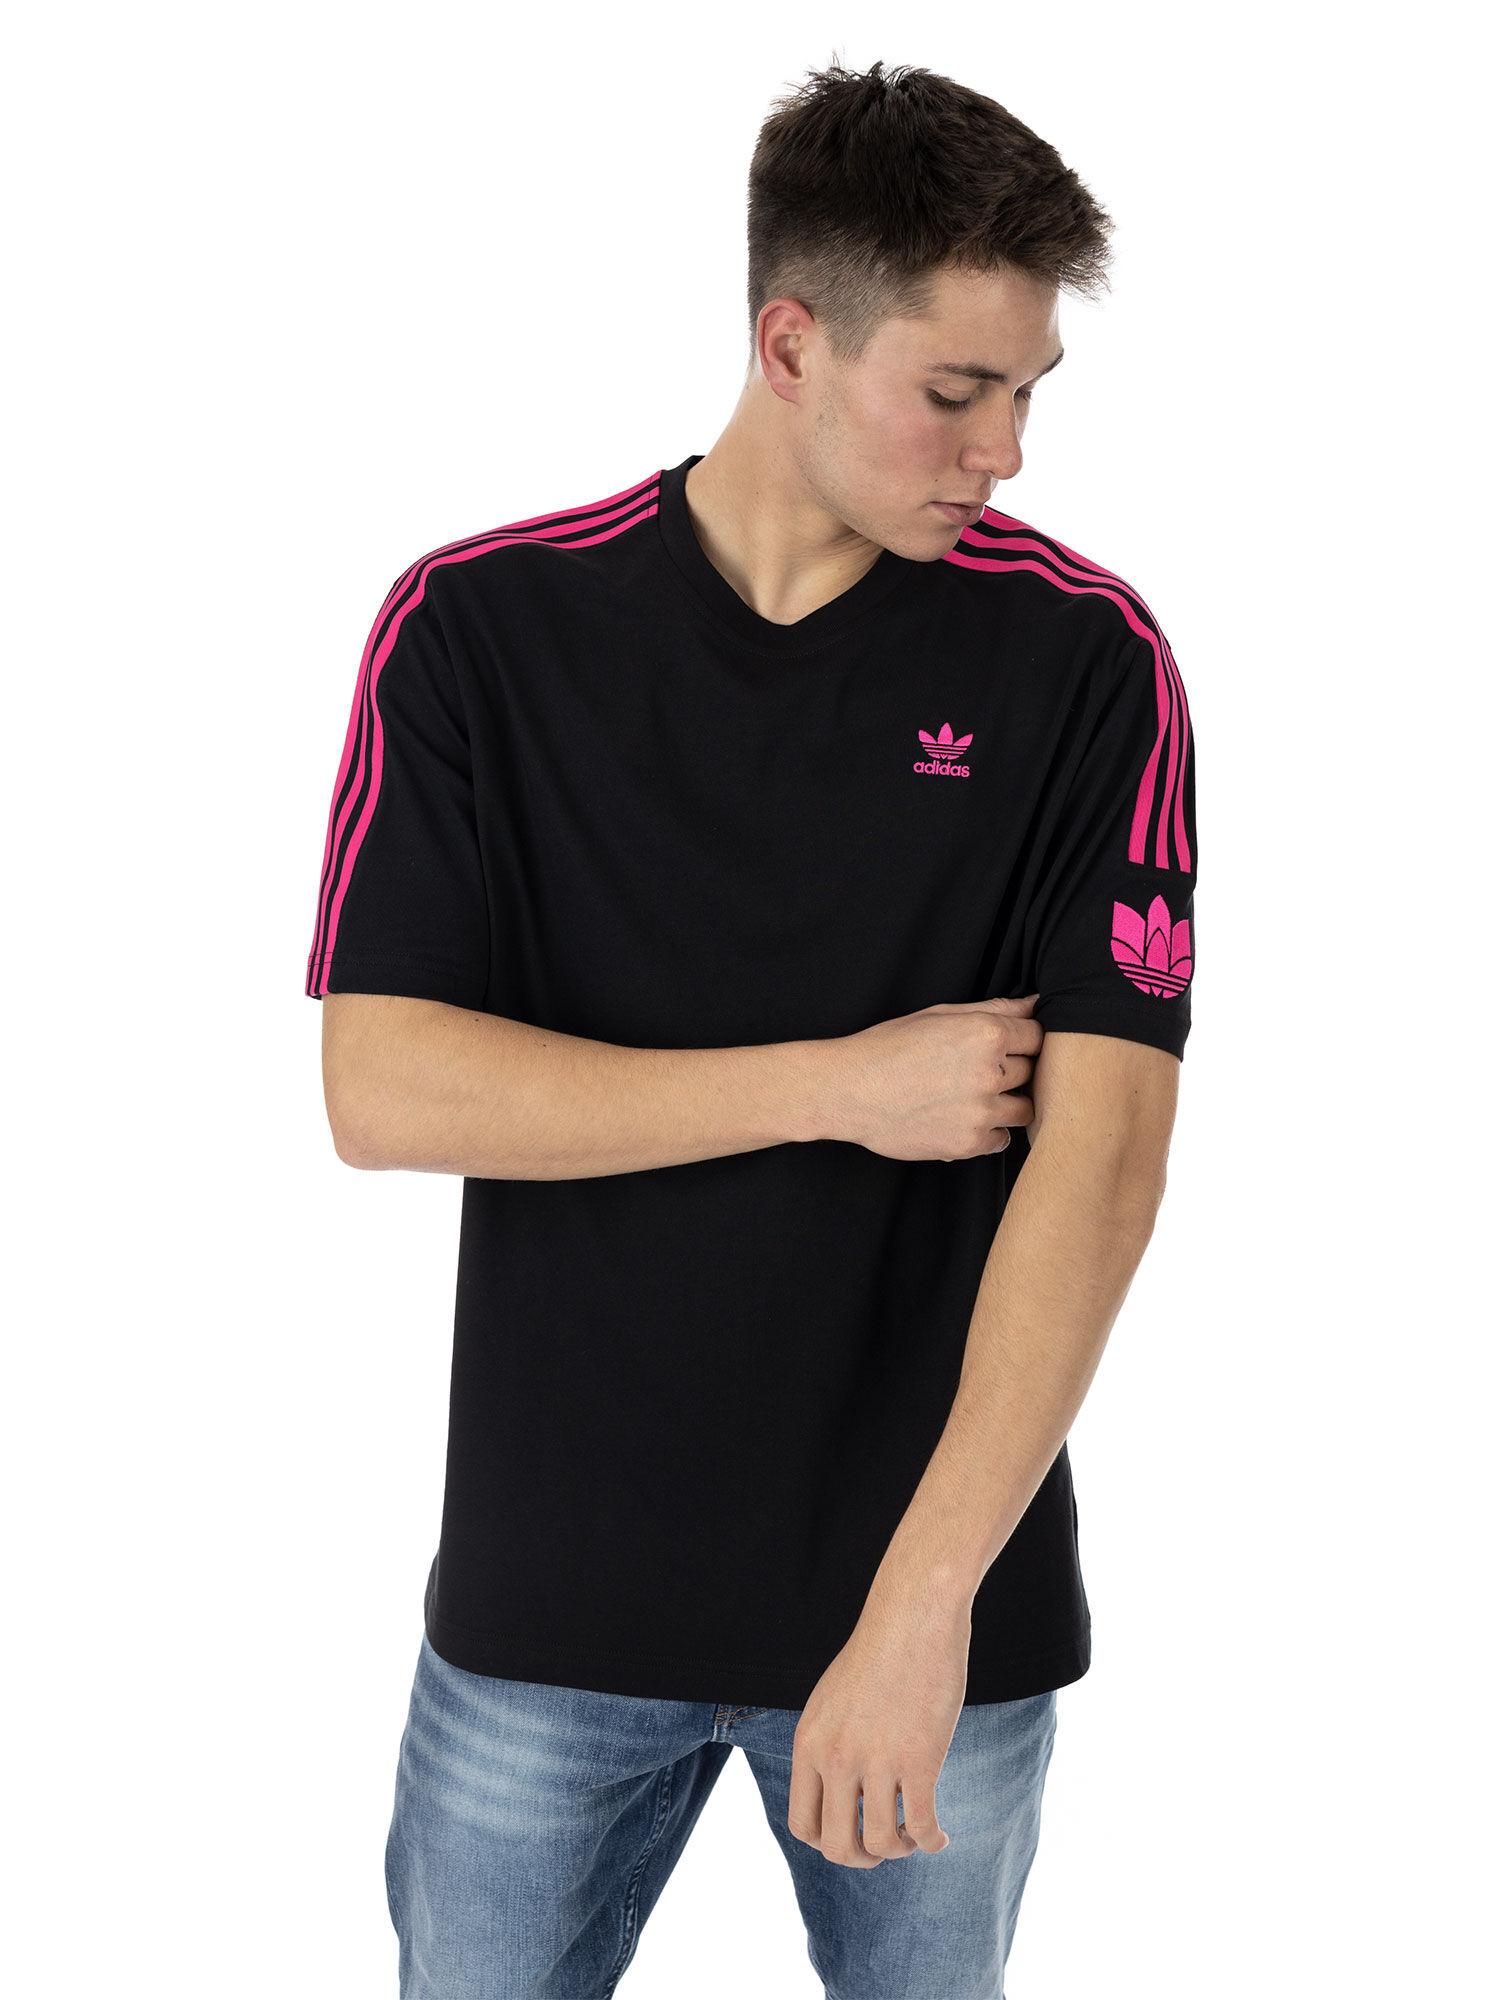 adidas 3D Trefoil 3 Stripes, taille S, homme, black/pink